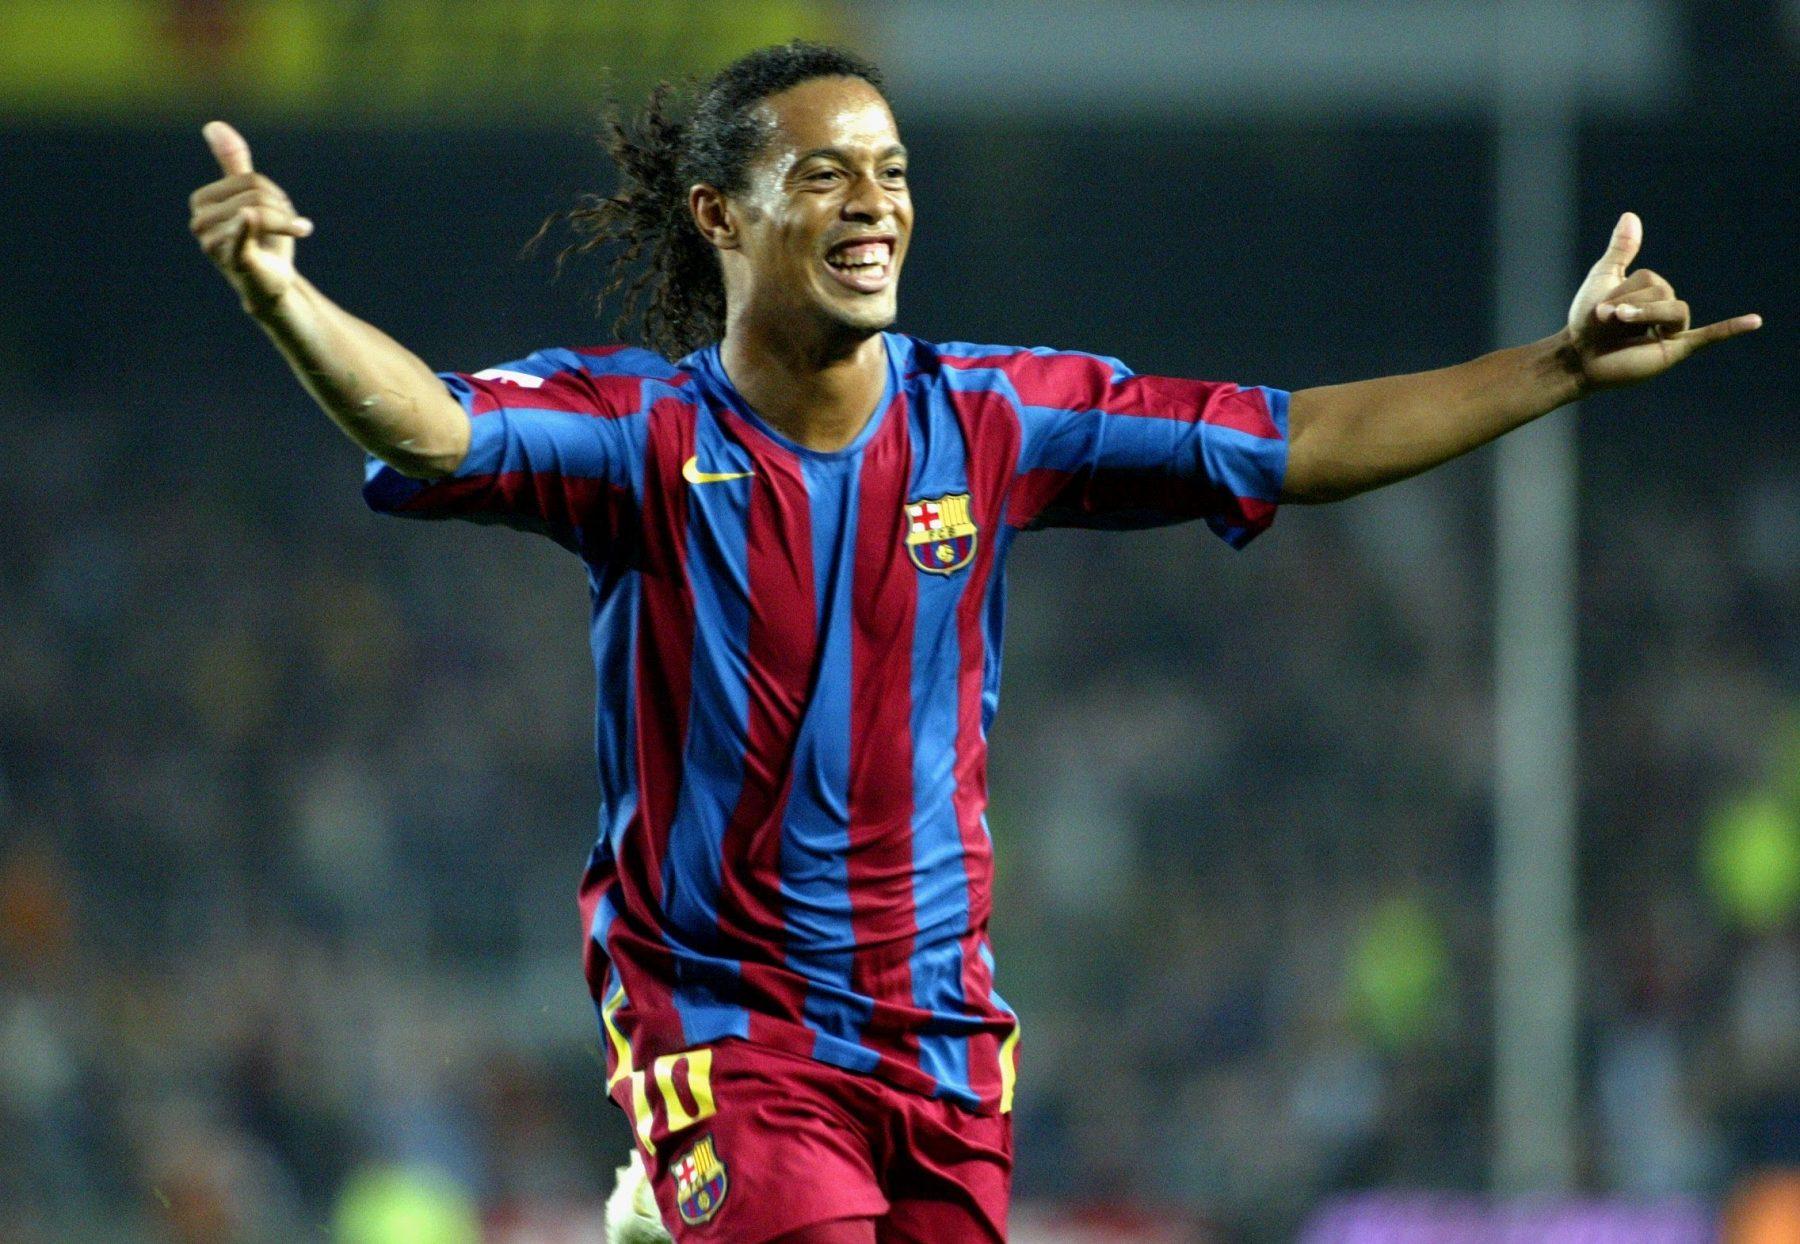 Ronaldinho Hd Wallpapers 7wallpapers Net